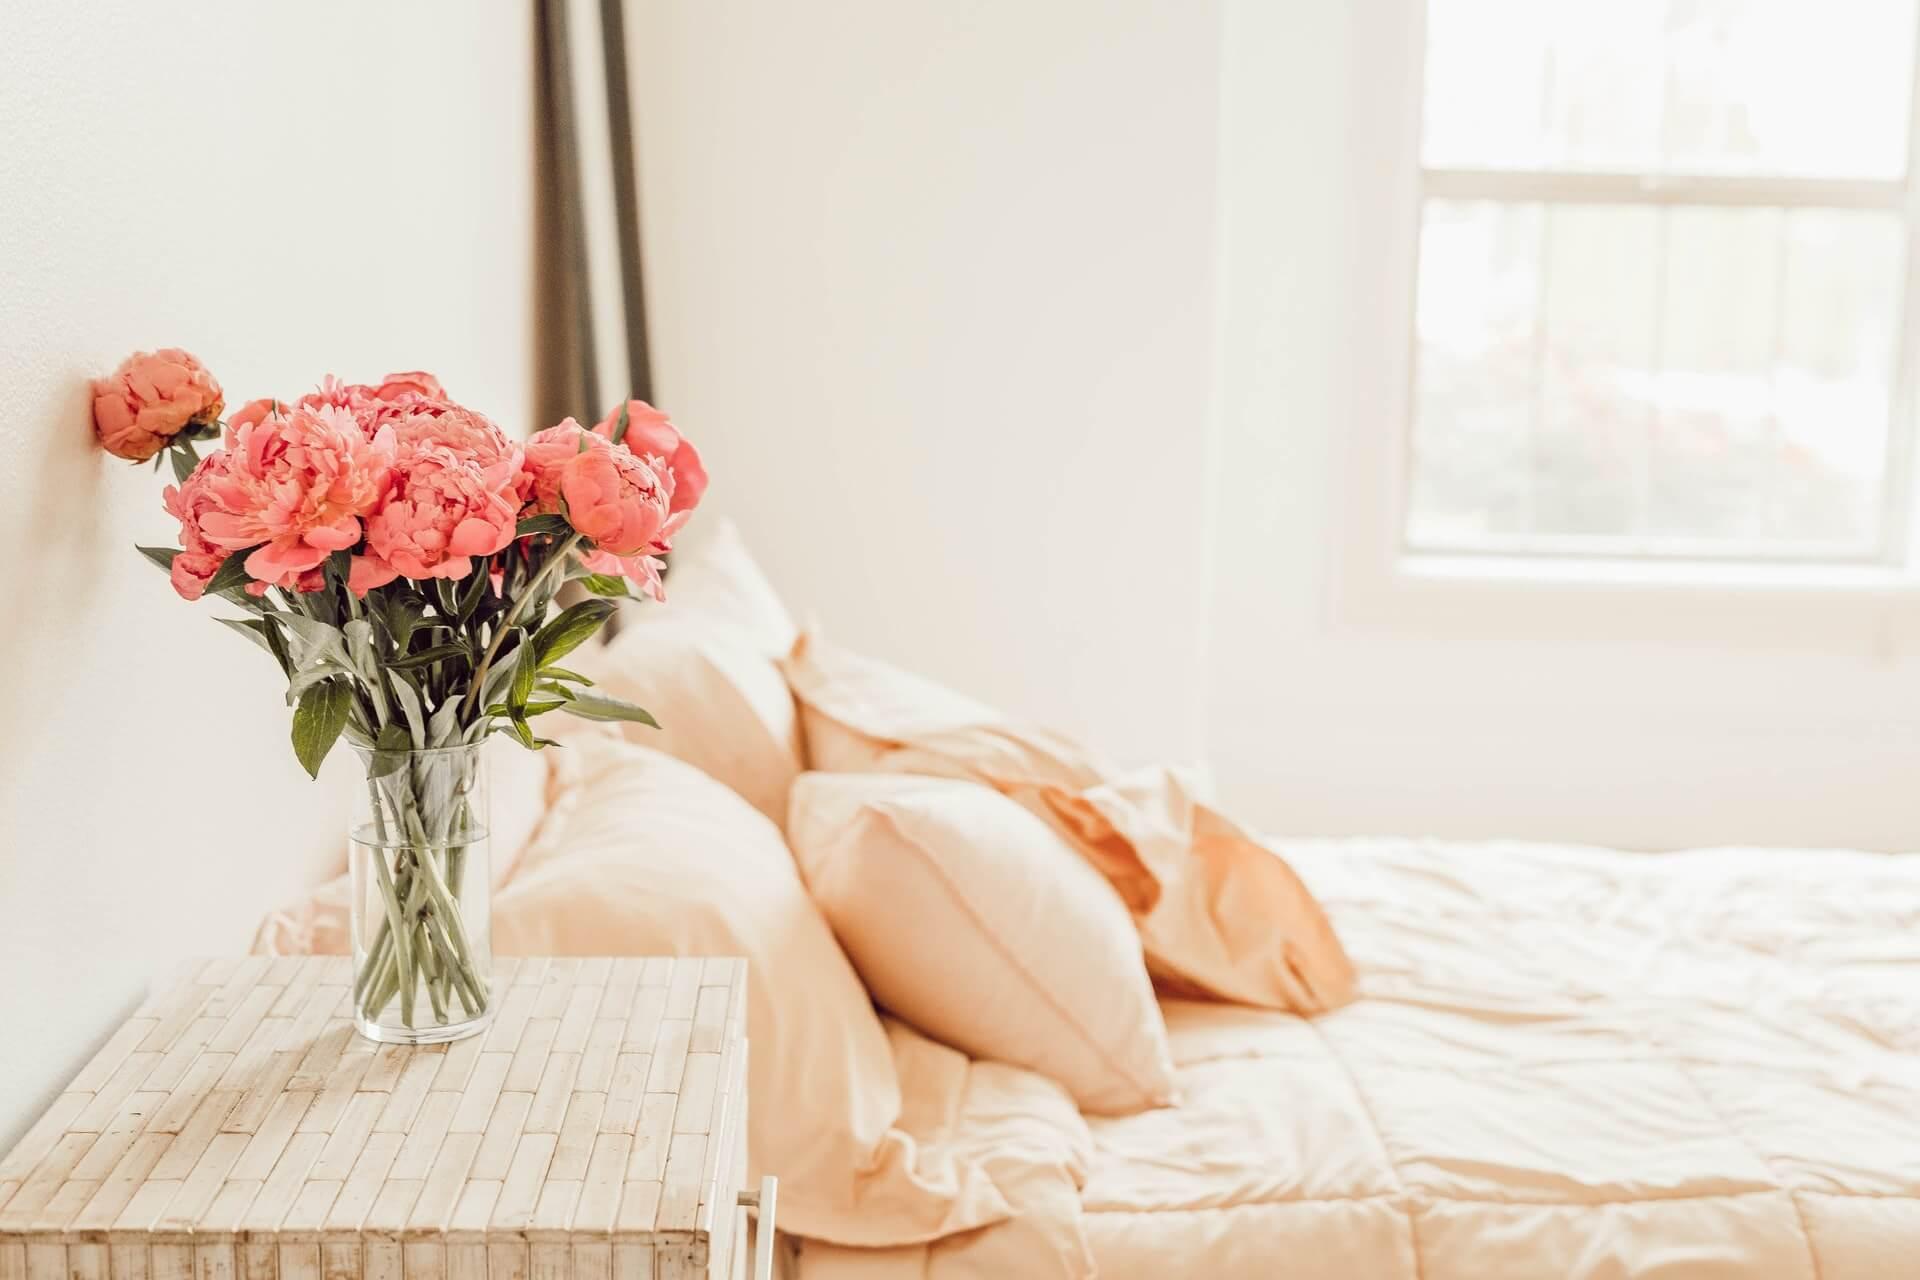 Vause Pink Flowers Bedroom